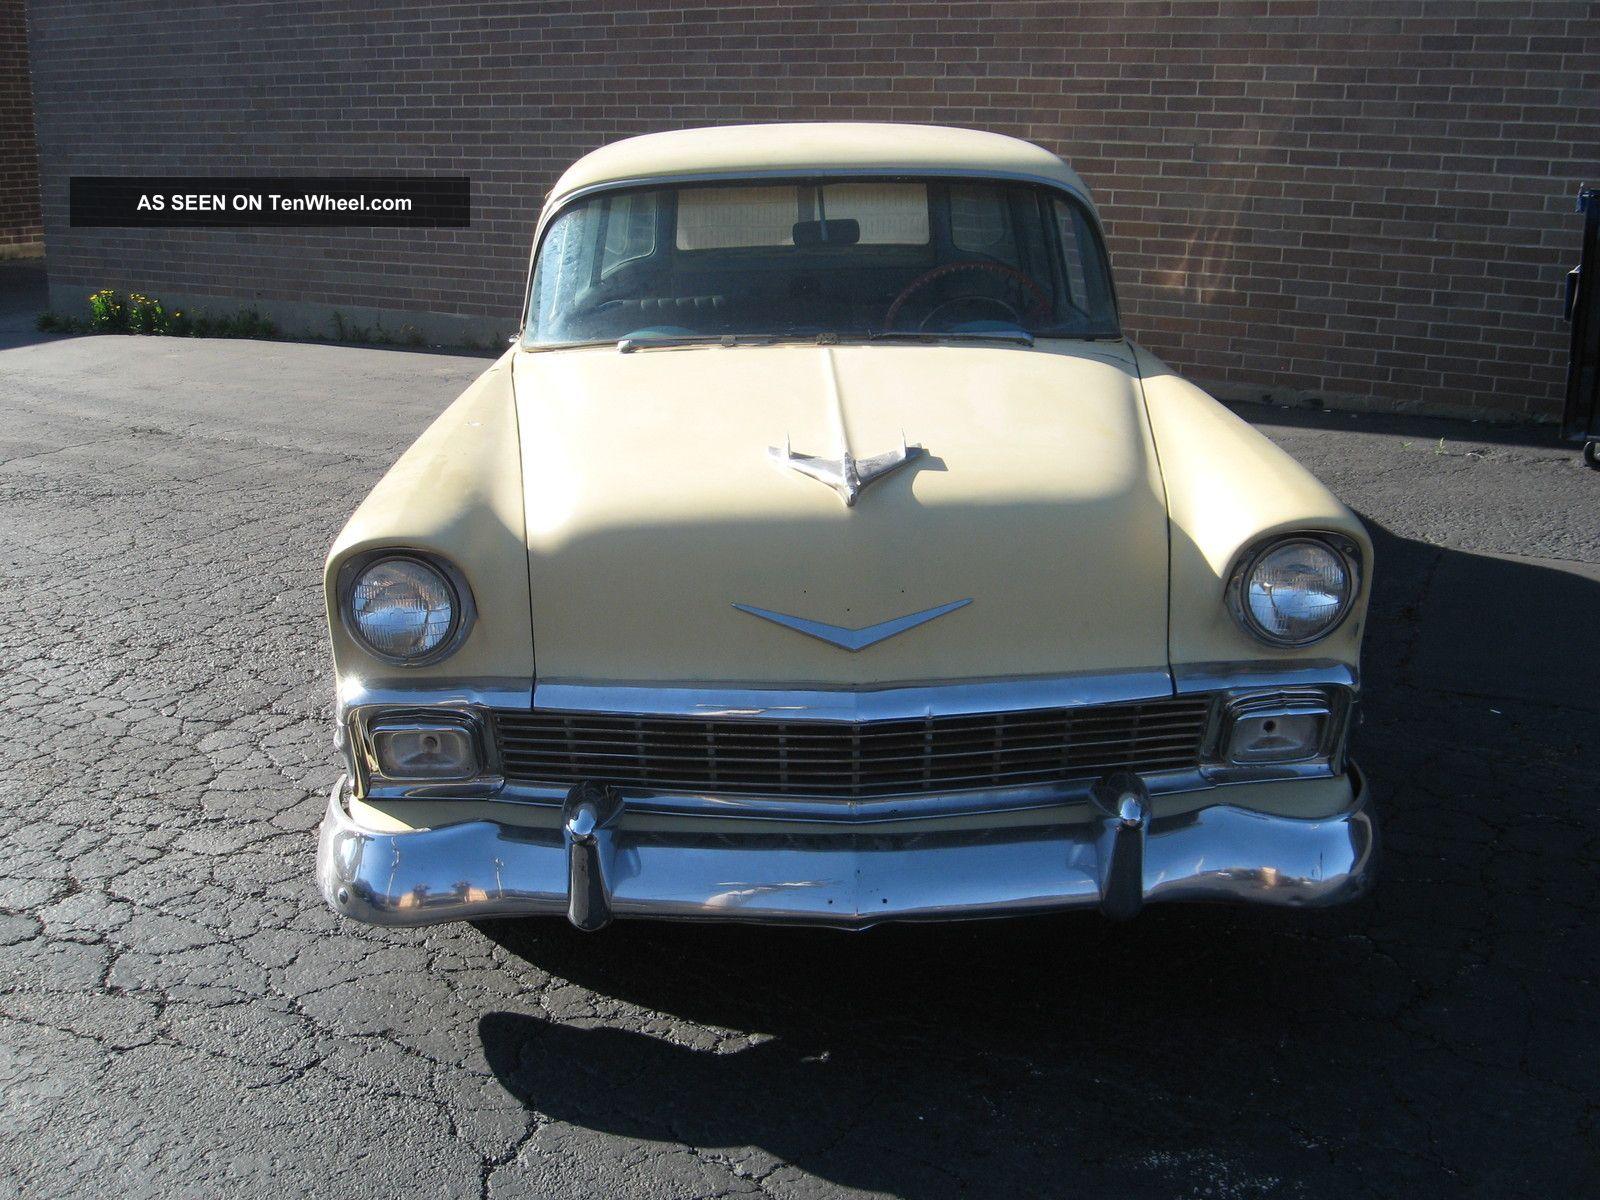 1956 Chevy 210 Four Door Wagon Bel Air/150/210 photo